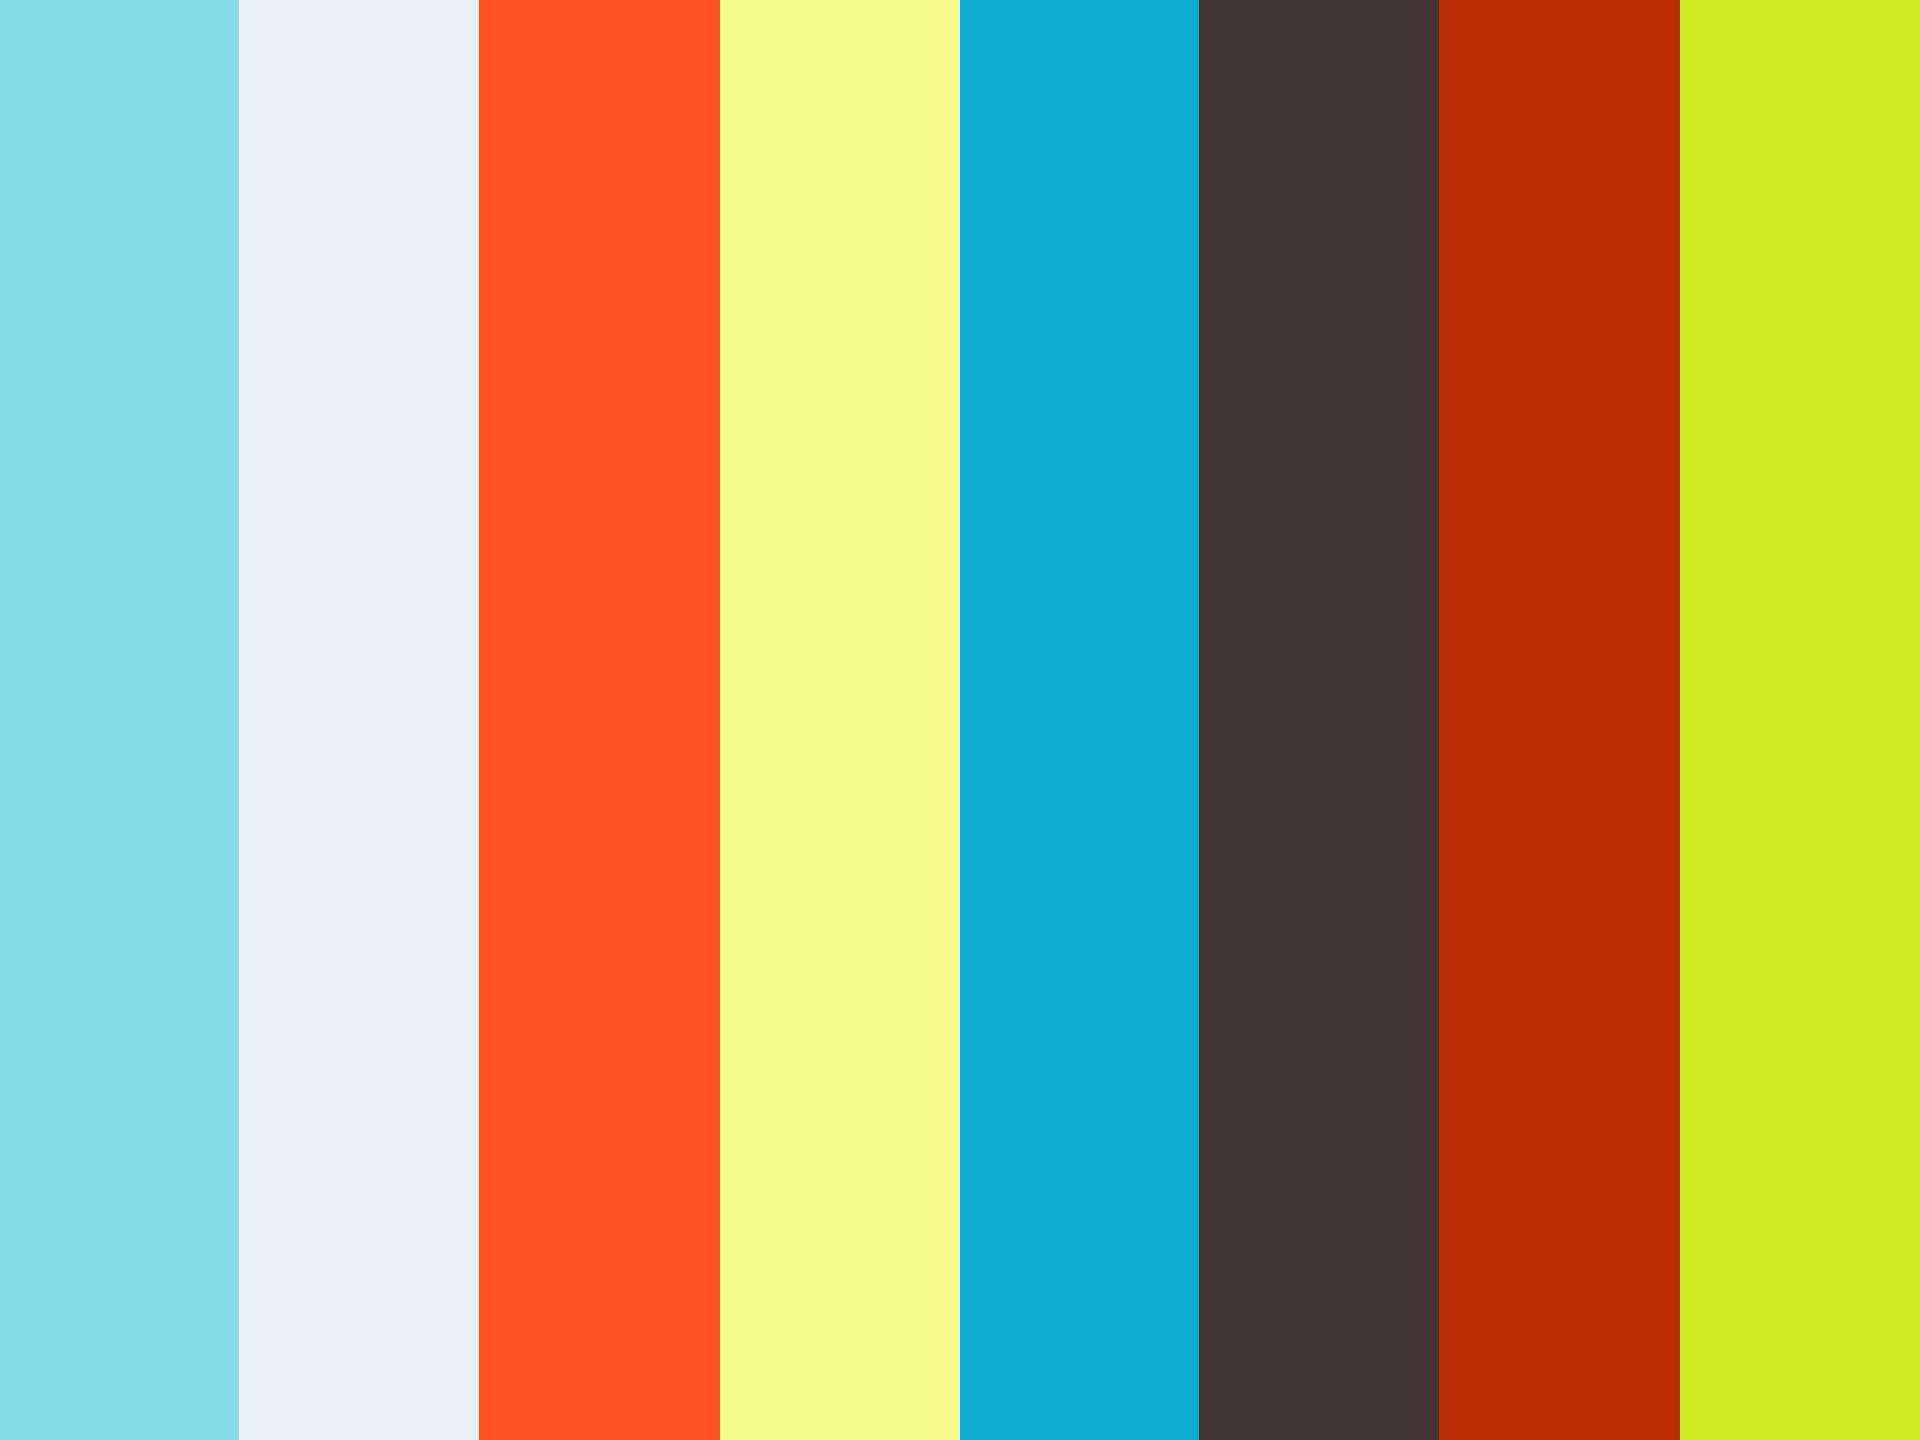 Craigslist Auto Posting Software 2016 On Vimeo